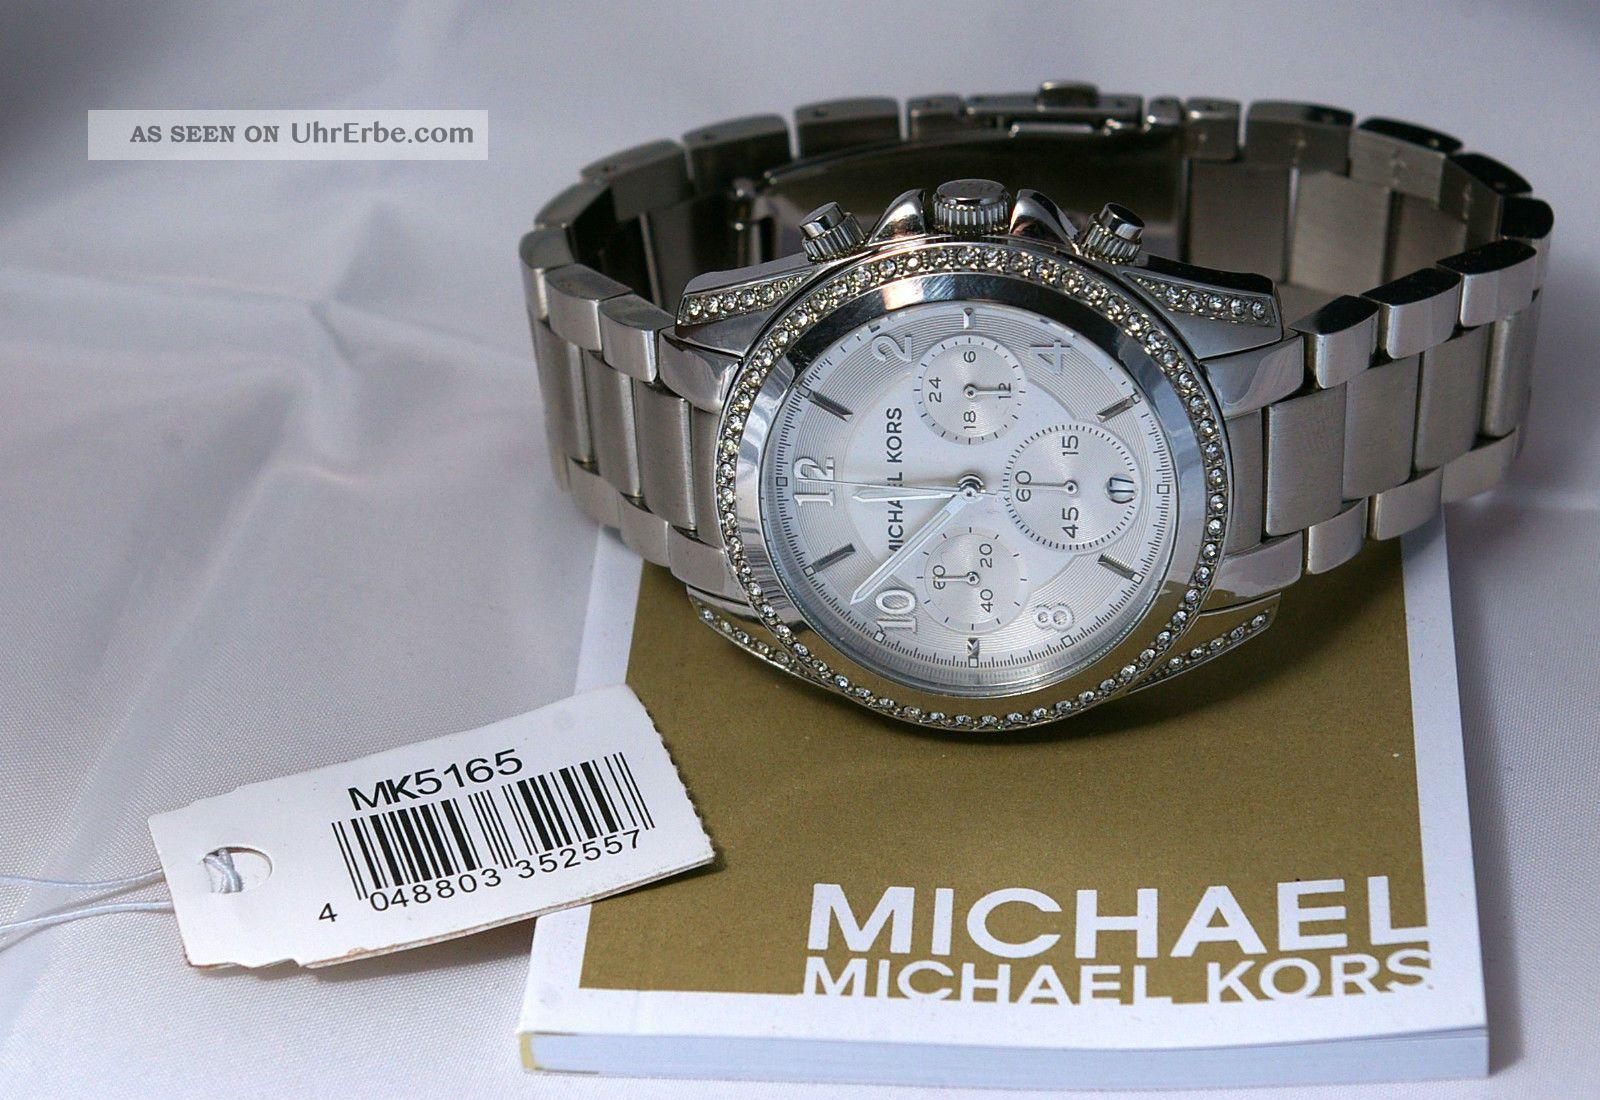 Michael Kors Chrono Mk 5165,  Wie Armbanduhren Bild